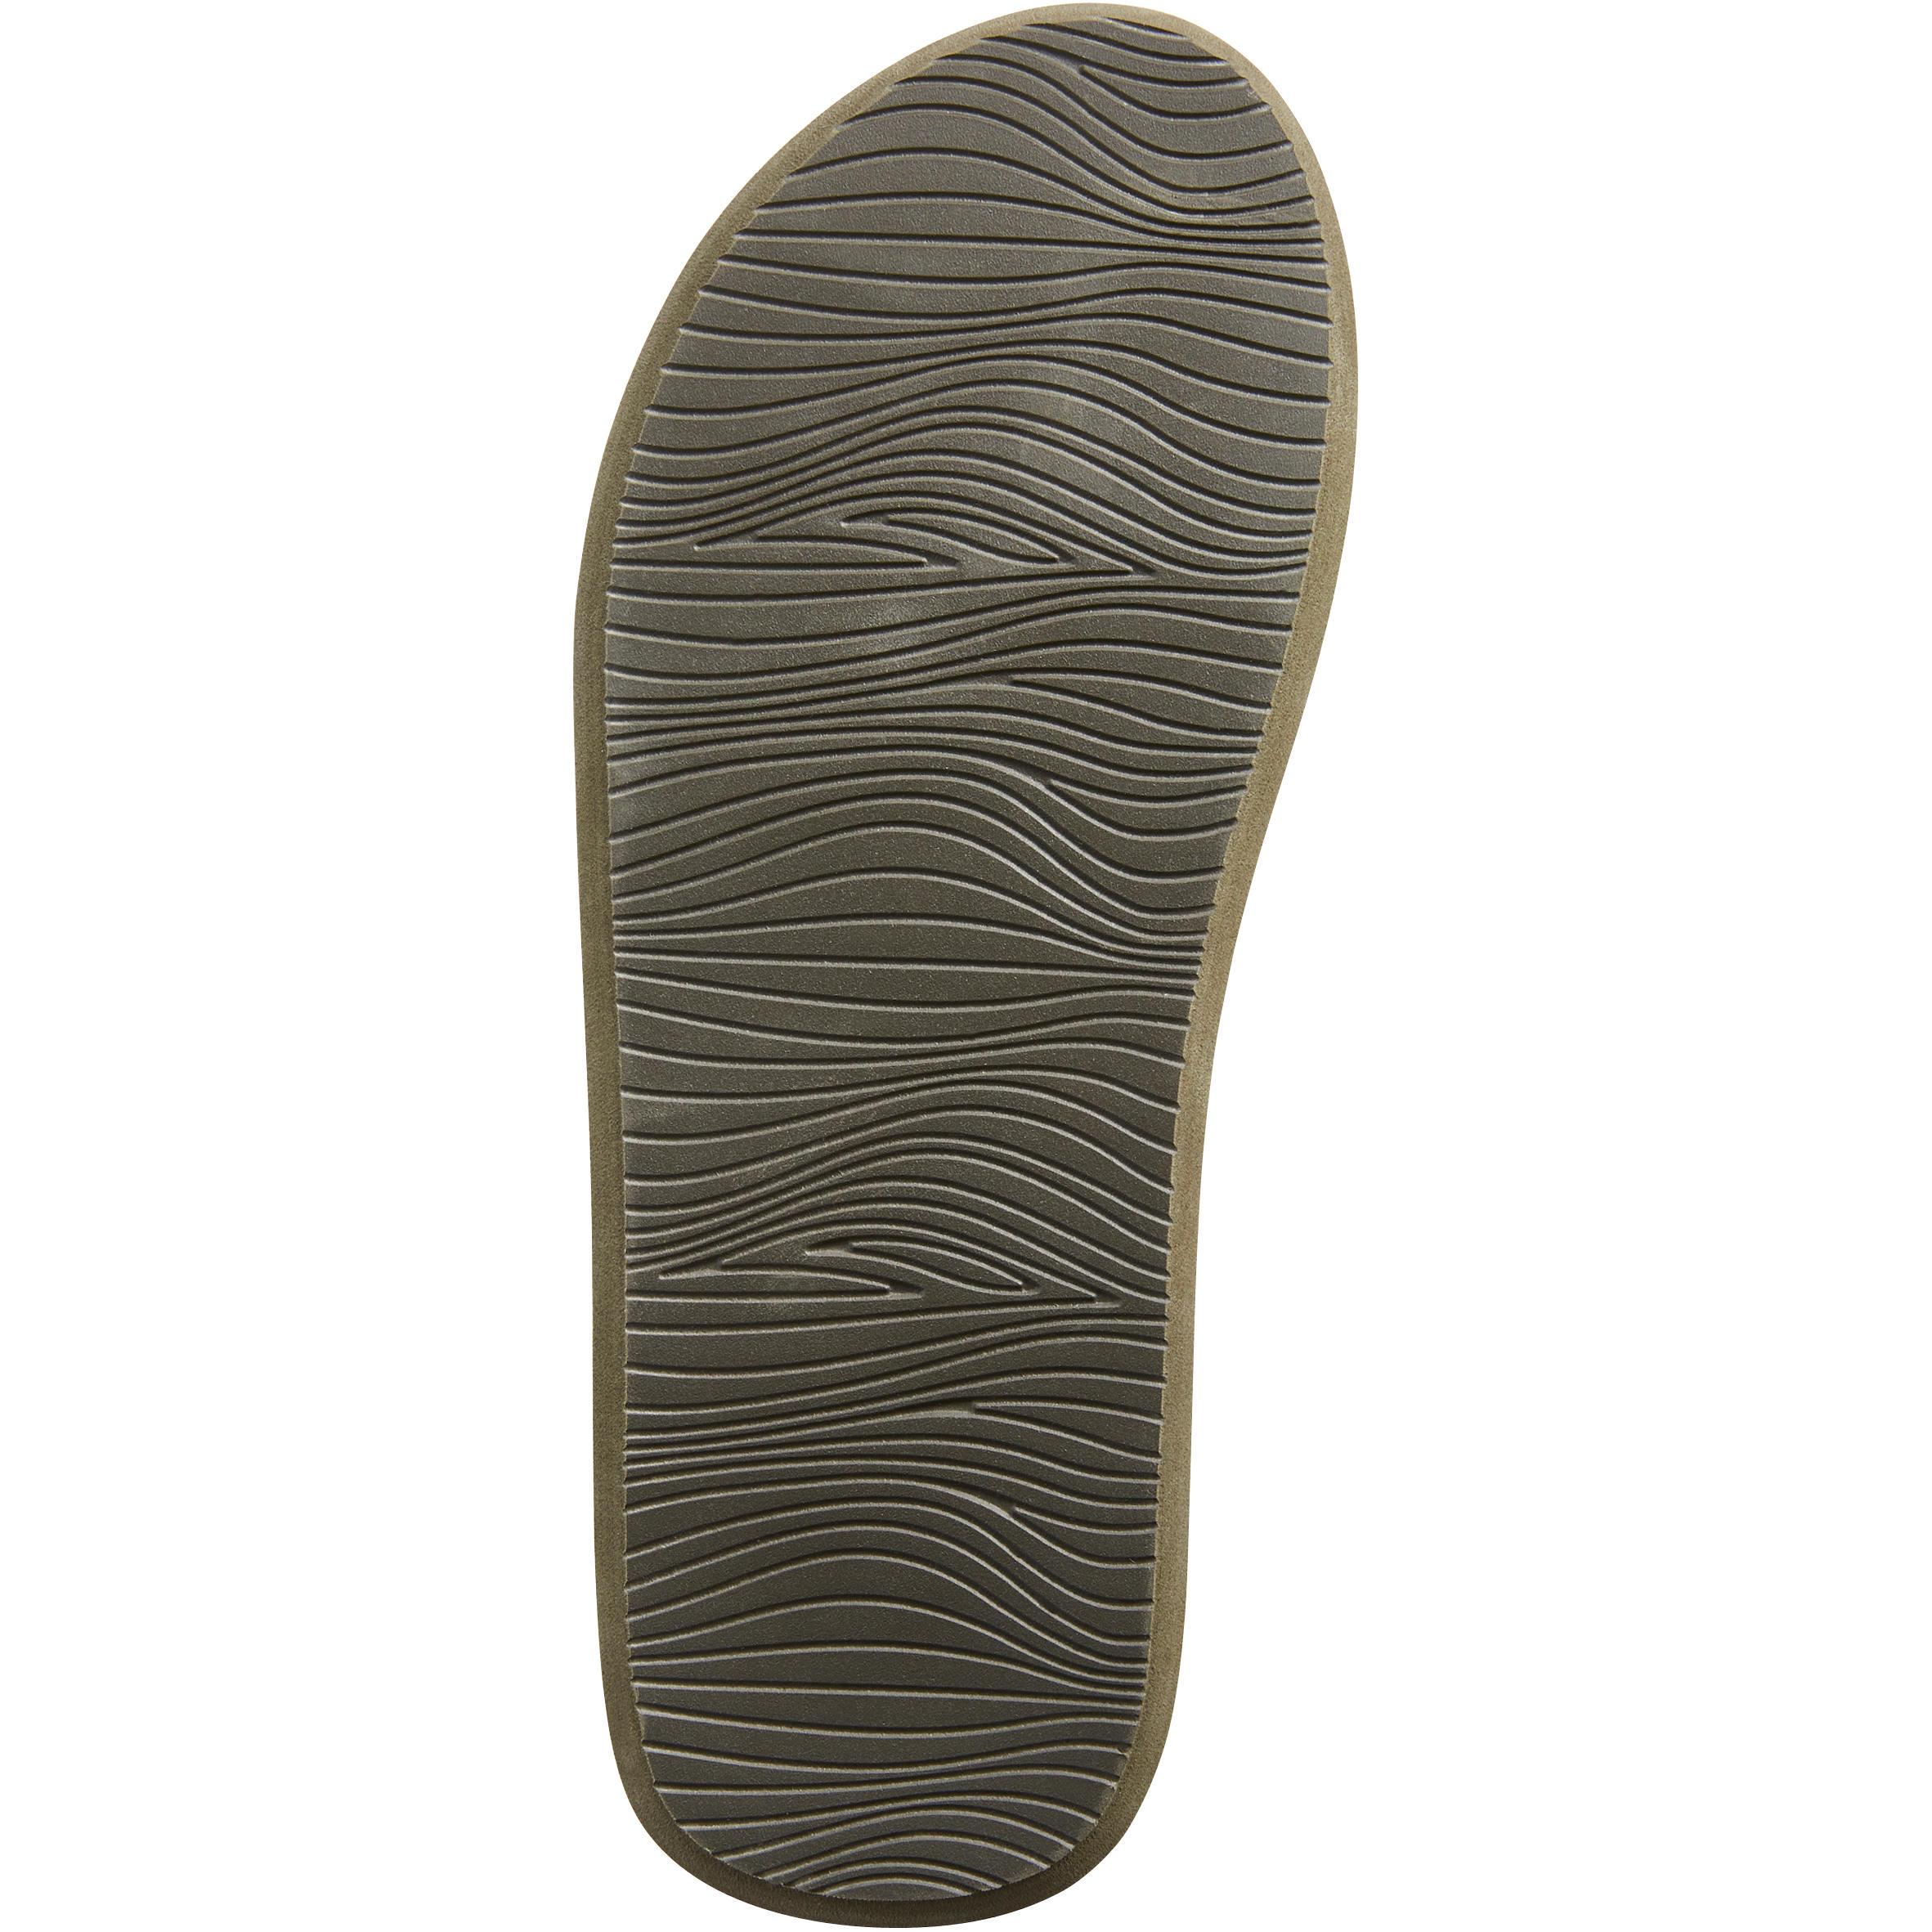 TO 550 M New Men's Flip-Flops - Khaki